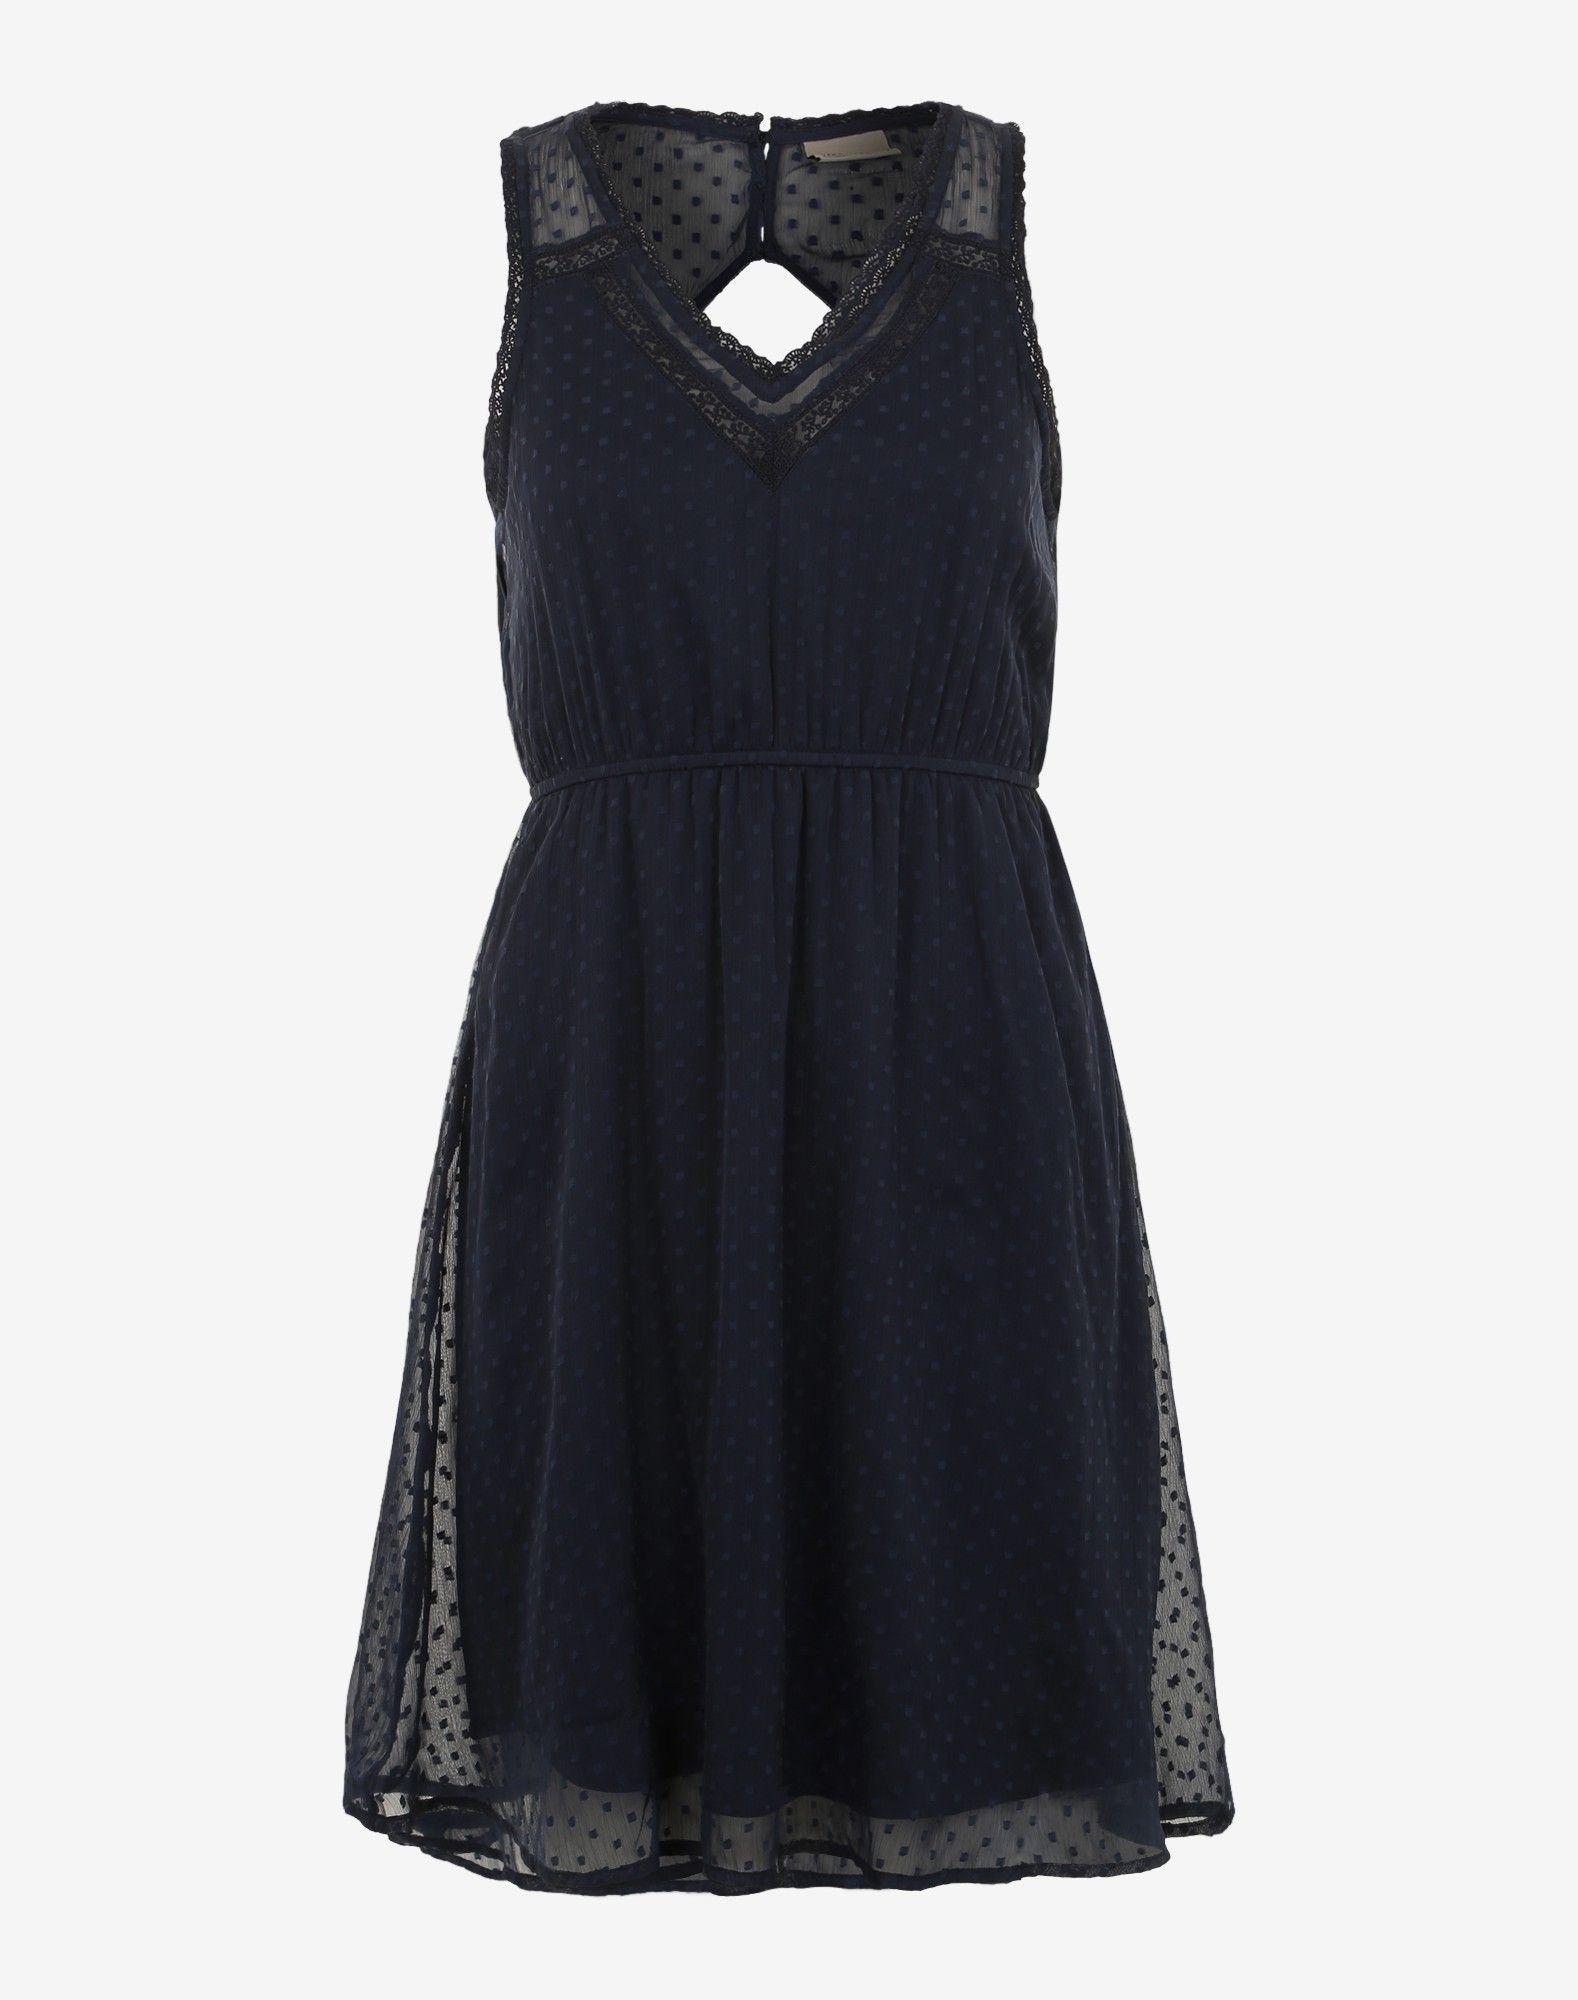 kurzes kleid 'vmbianca' - dunkelblau | kurze kleider